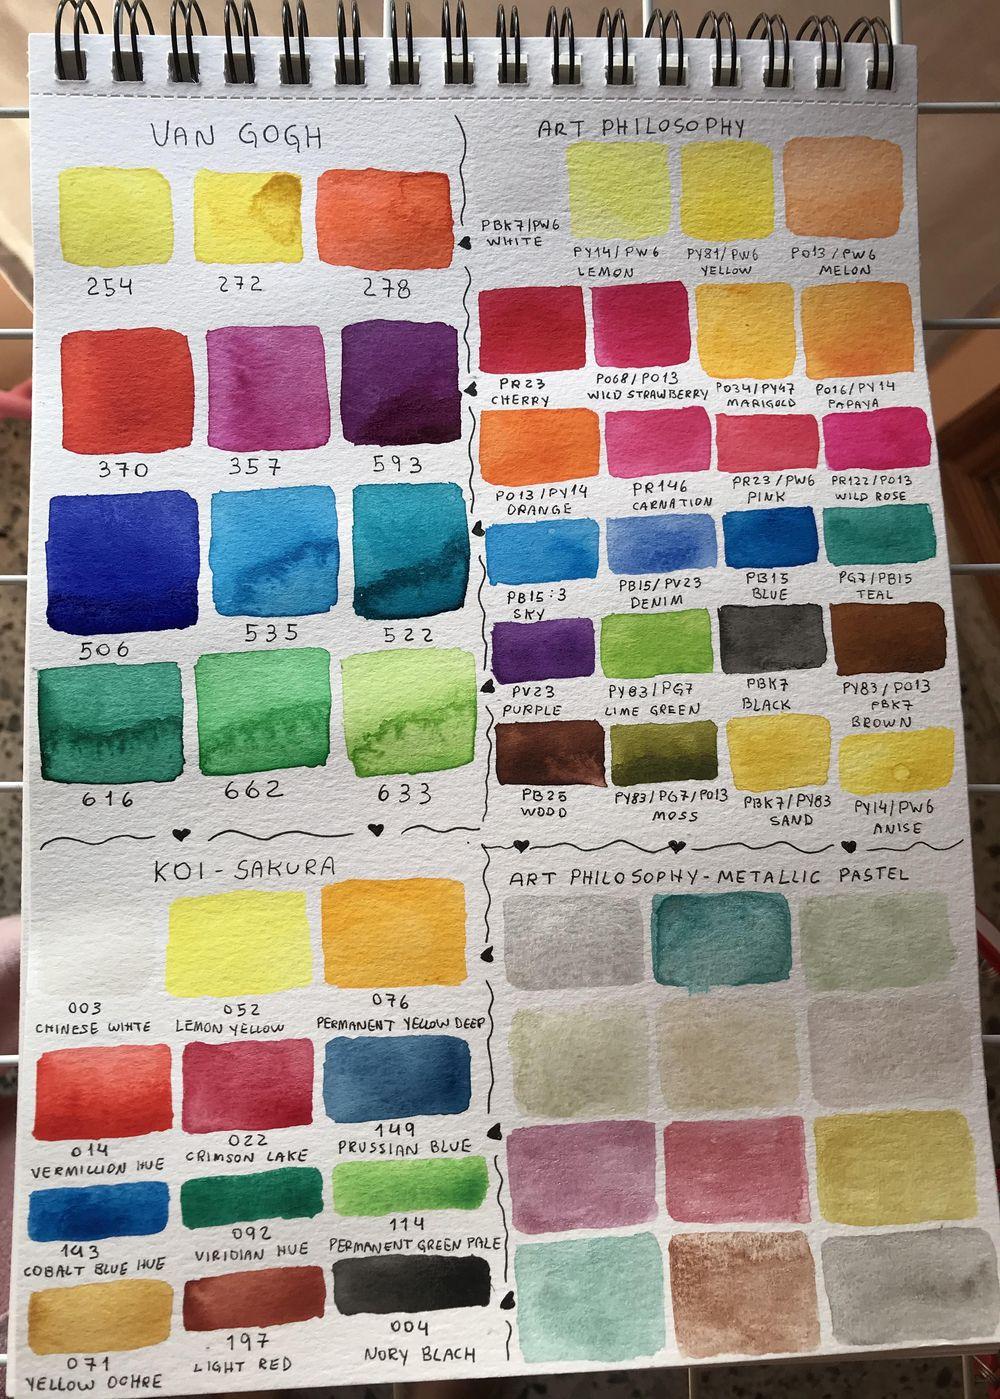 Van Gogh/Art Philosophy(Prima)/Sakura-Koi - image 1 - student project